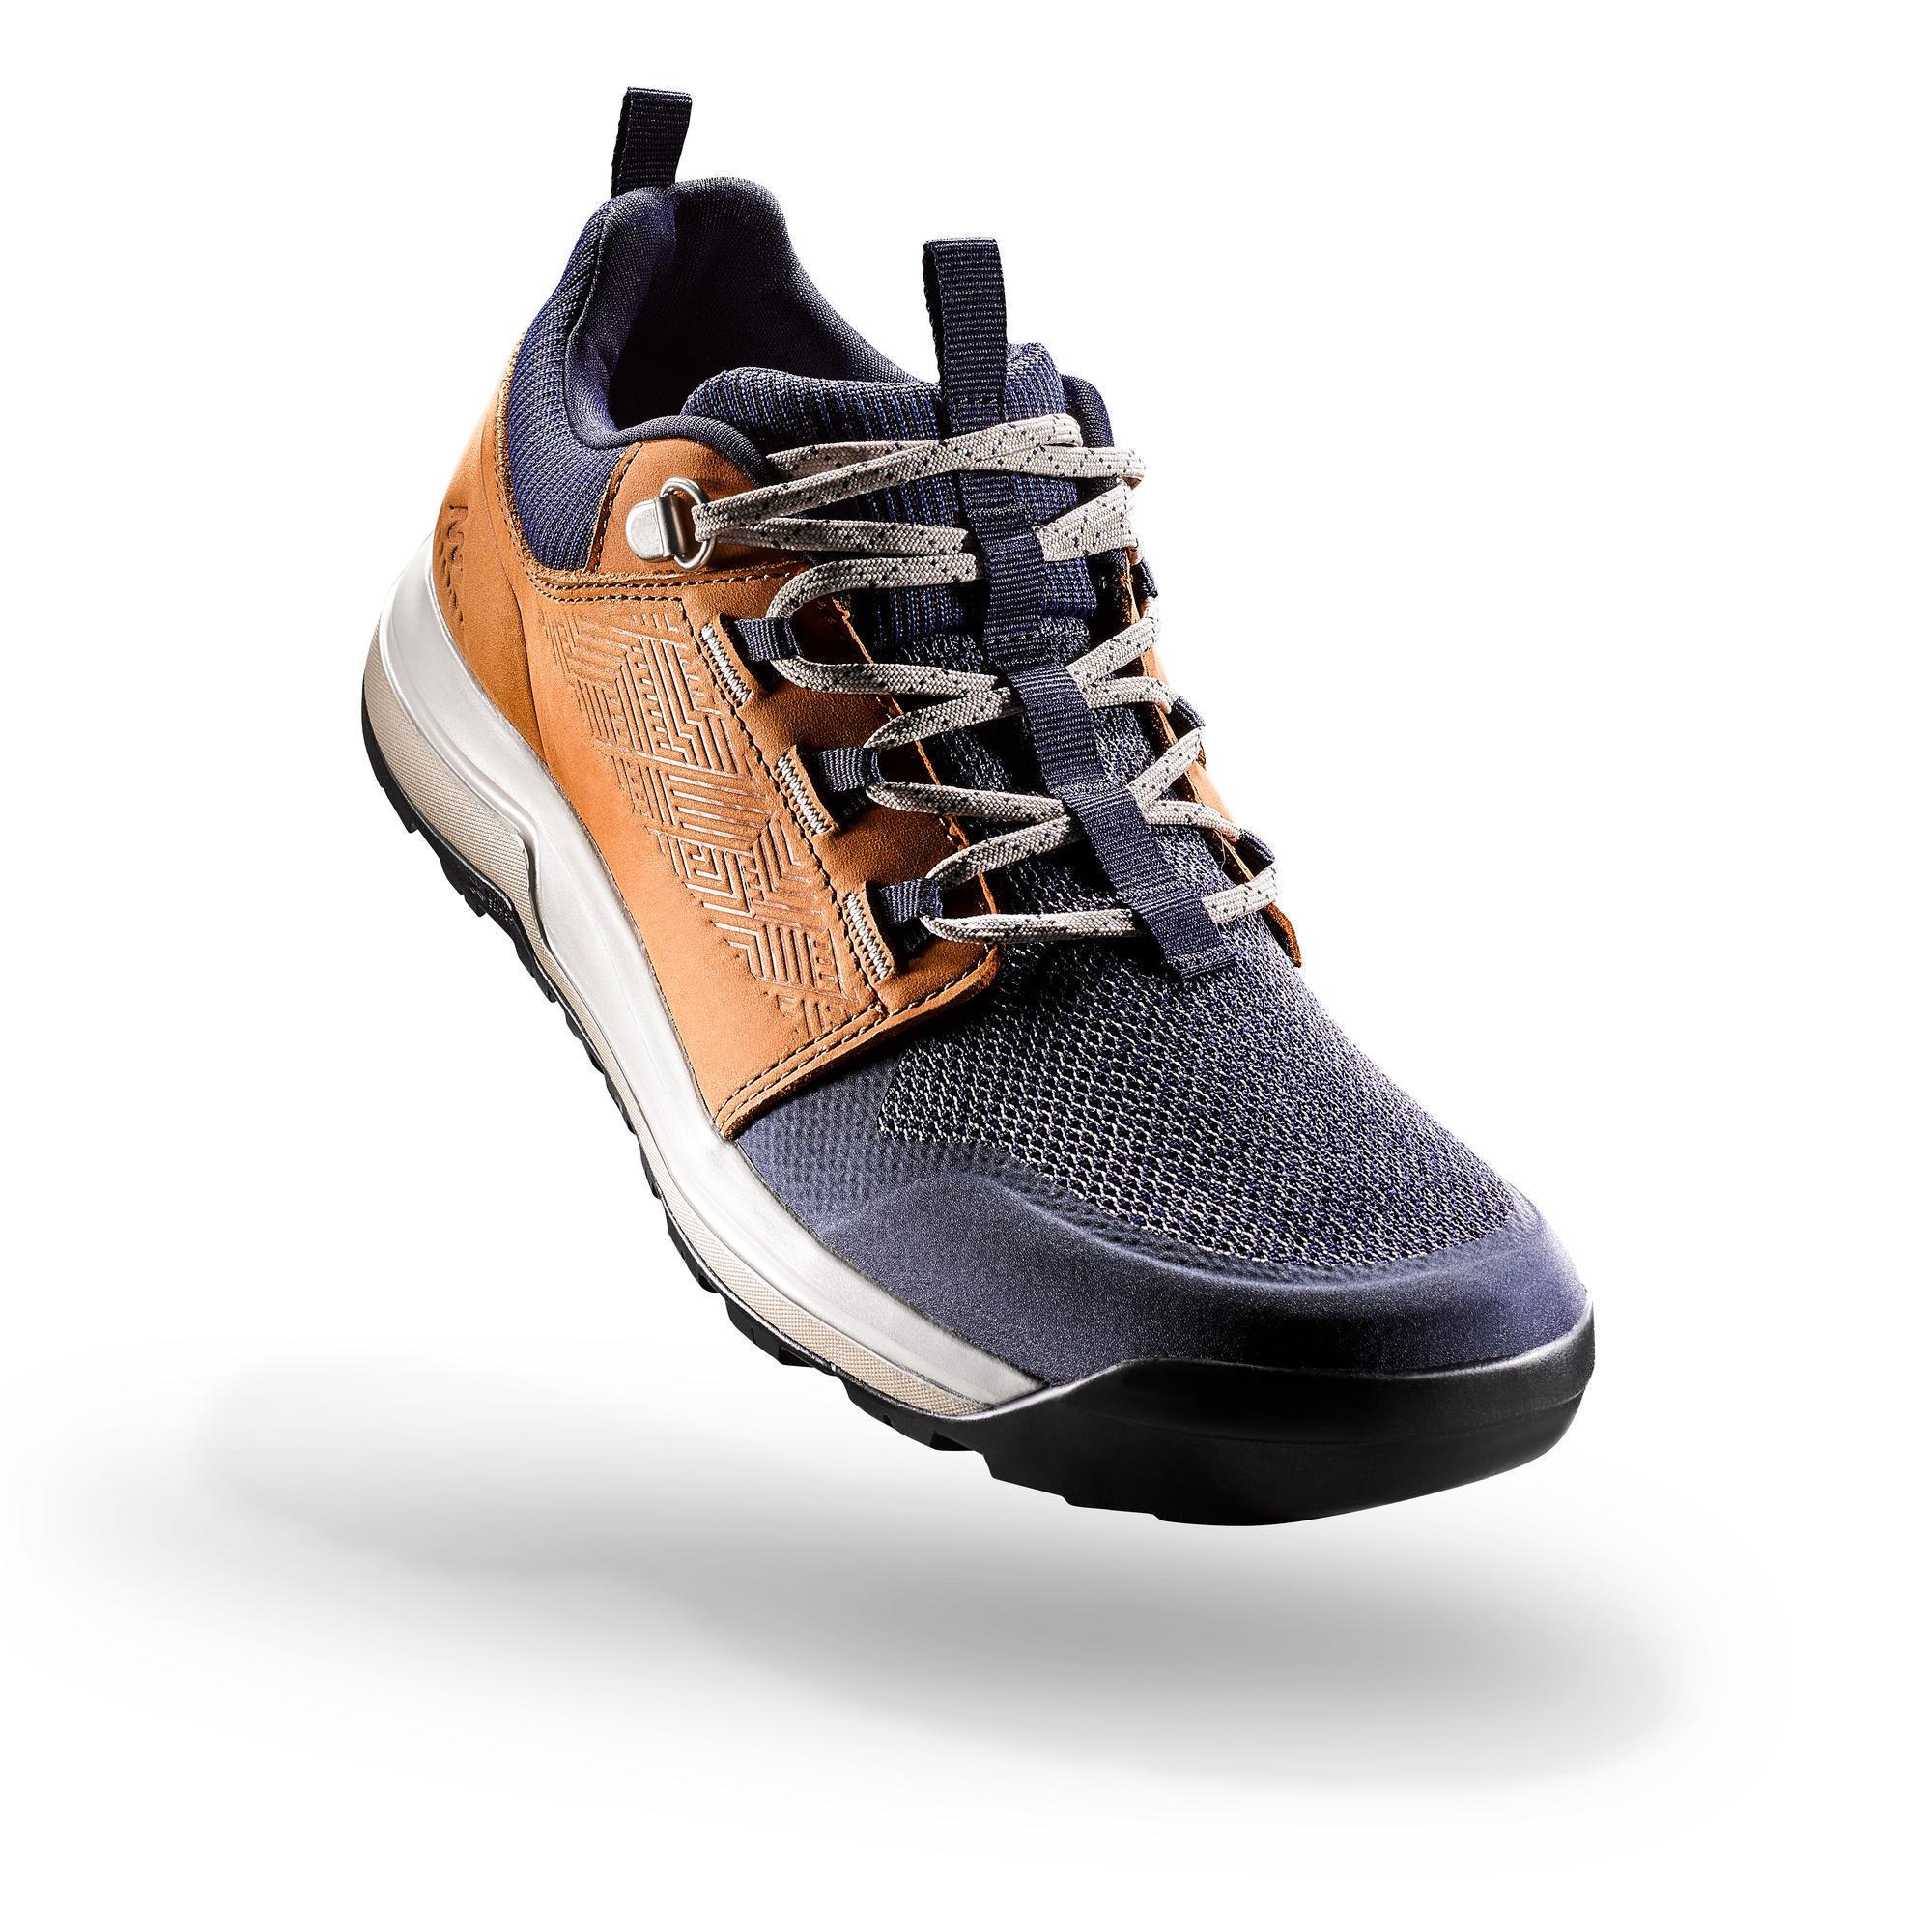 Hiking \u0026 Trekking Shoes - Decathlon